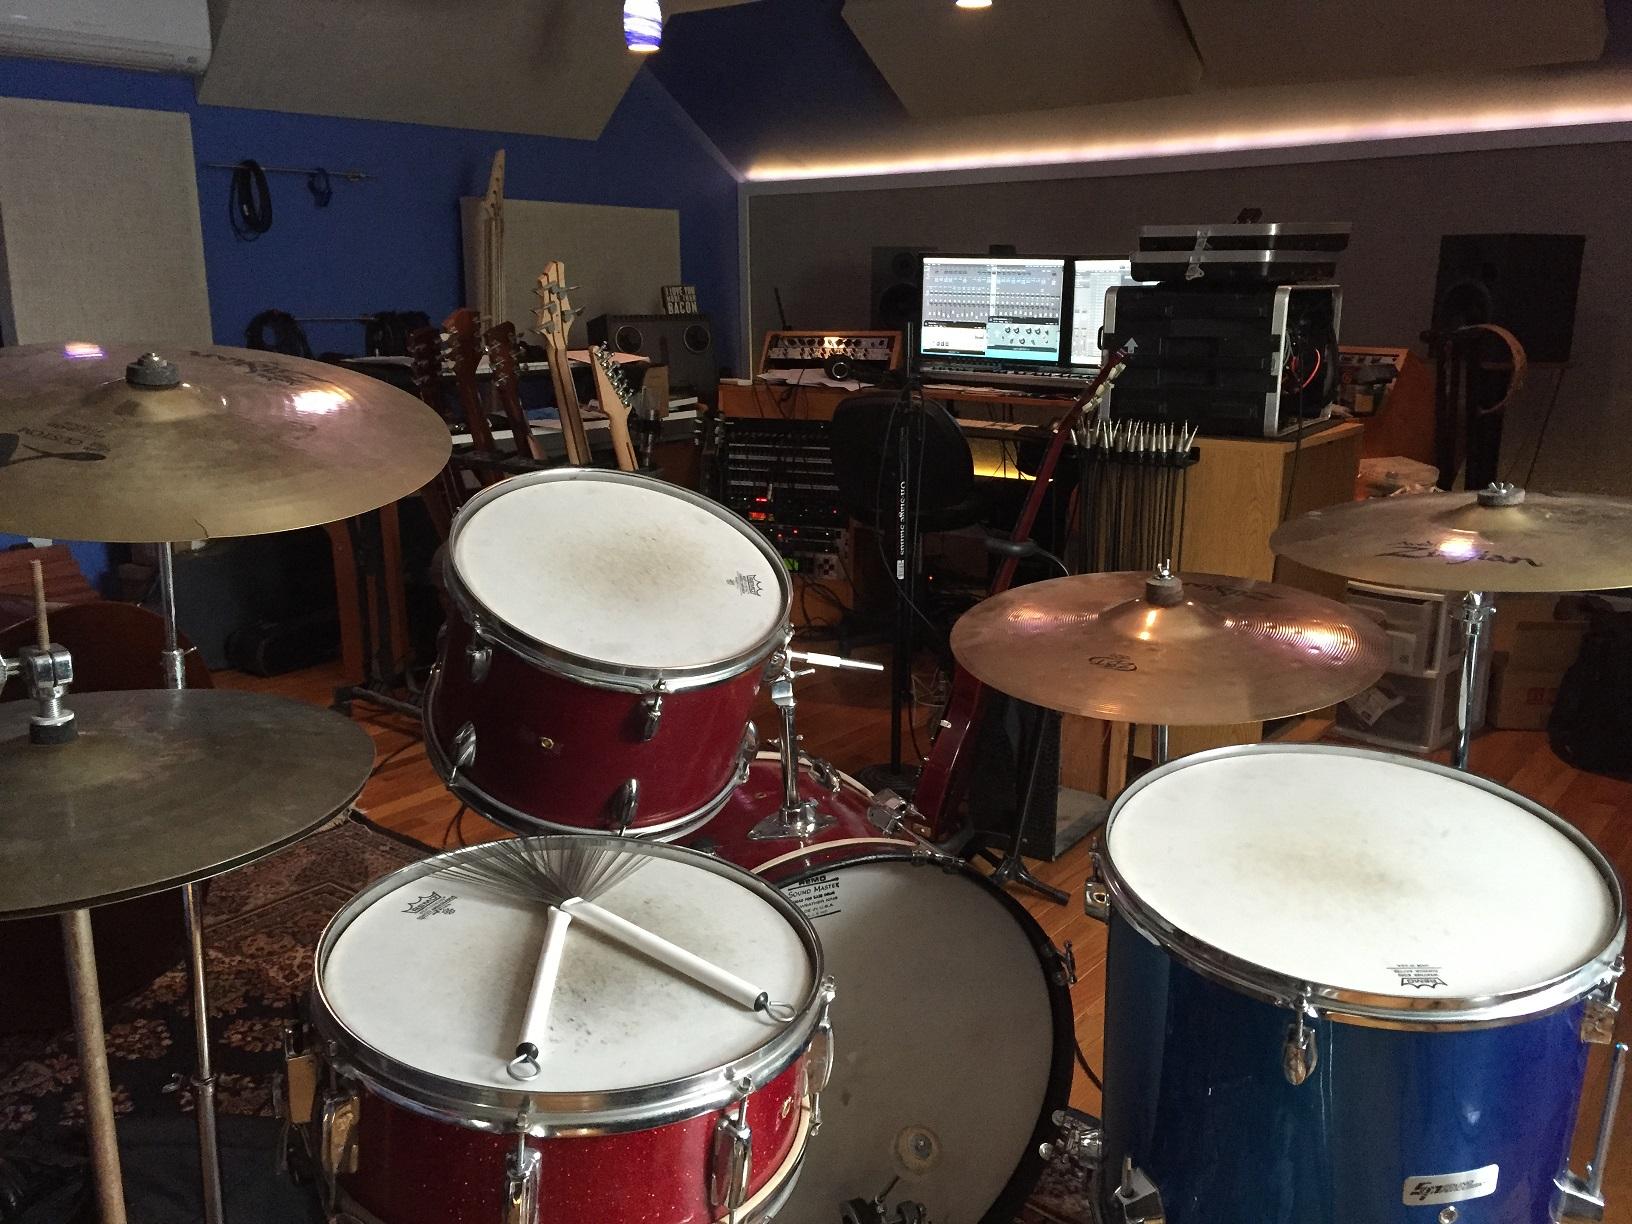 skewsound_instruments_kneedeep_2